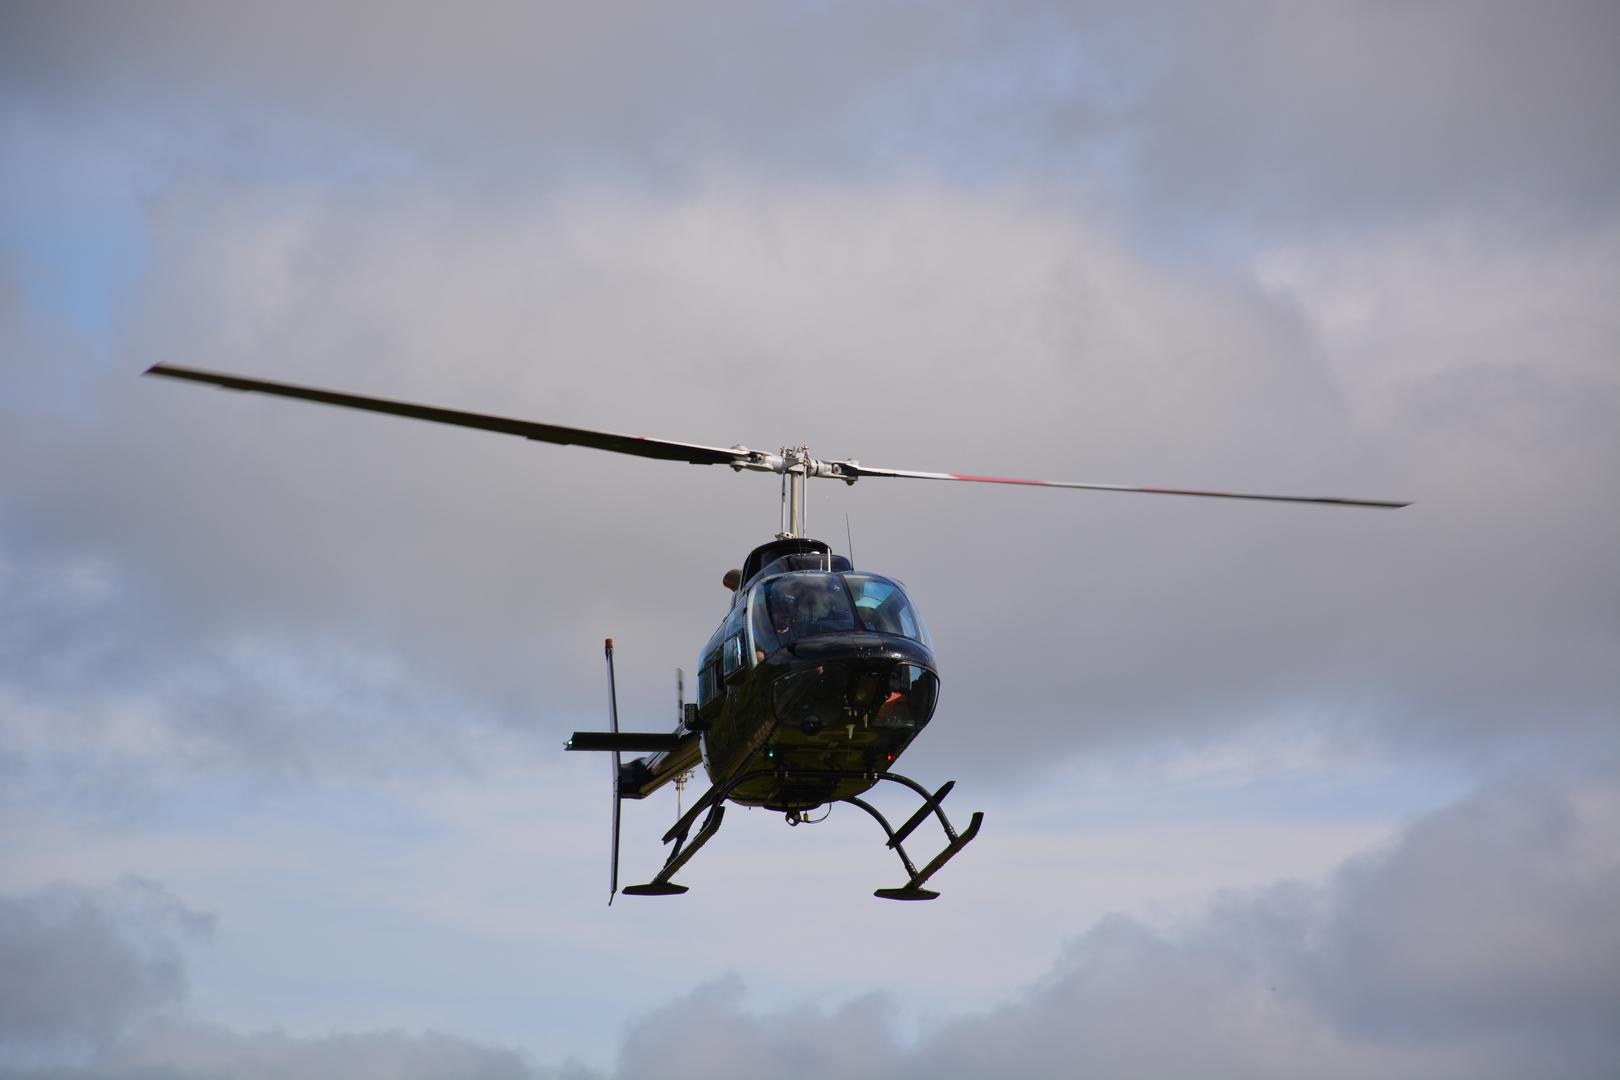 helicopter charter service in saskatchewan bell 407 bell 206